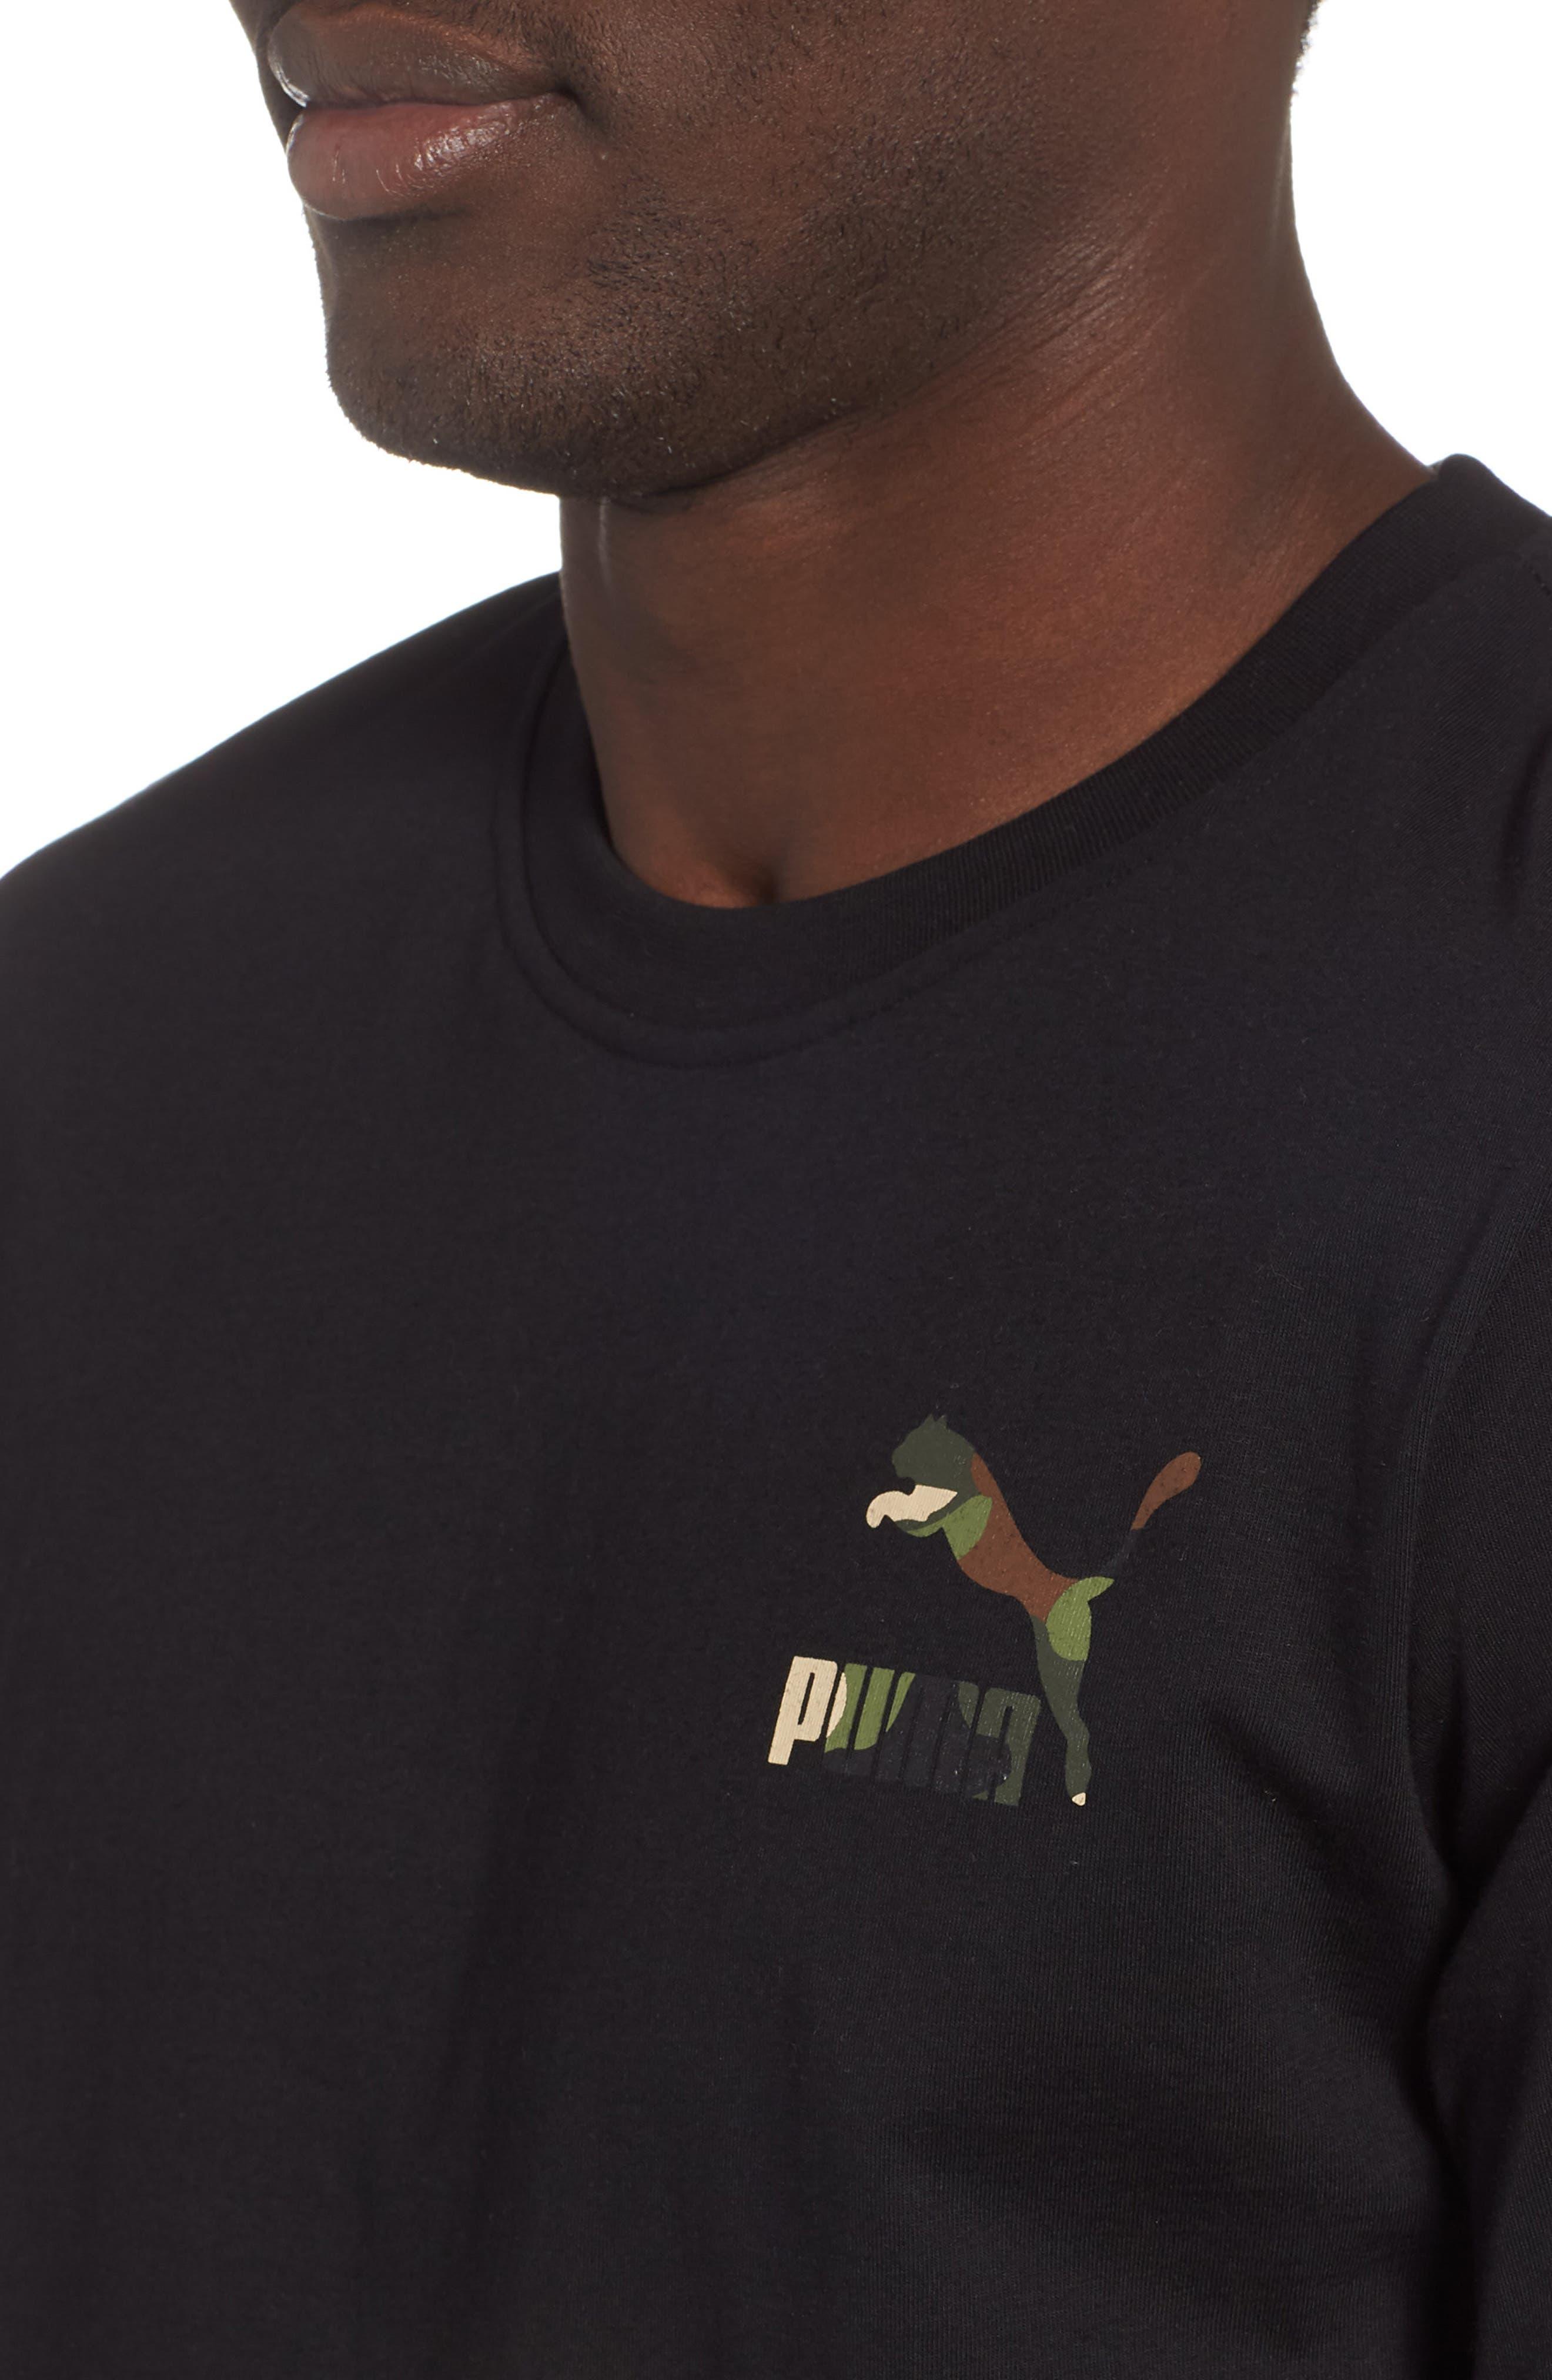 Wild Pack Logo Graphic T-Shirt,                             Alternate thumbnail 4, color,                             PUMA BLACK